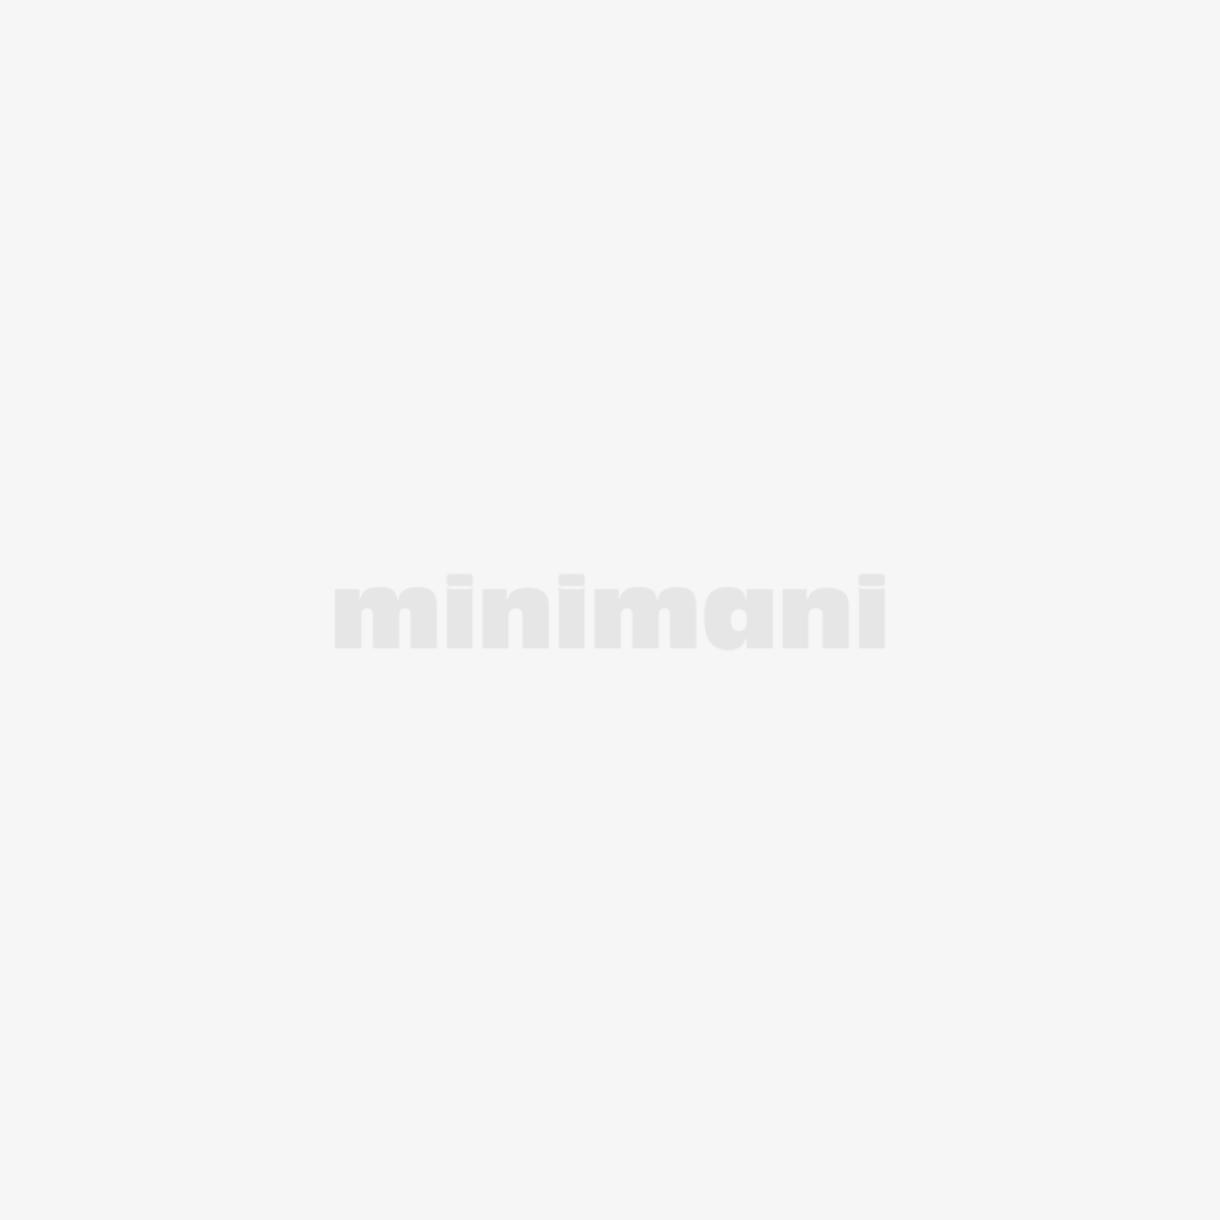 RENTO LAUDELIINA PELLAVAFROTEE 50X150CM MUSTA-PELLAVA